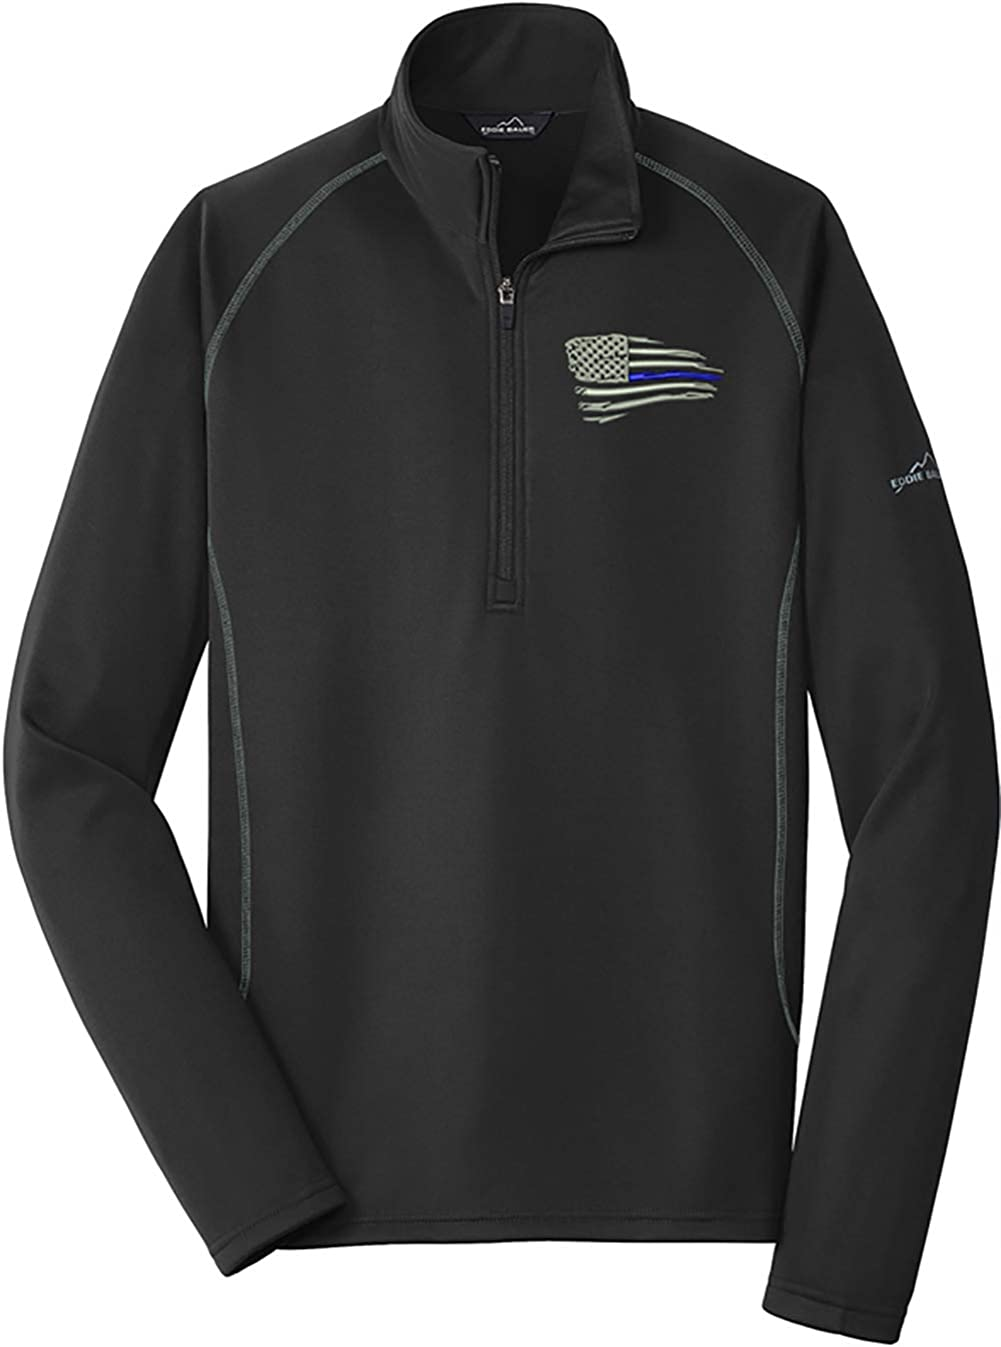 Peerless Distressed American Blue Line Flag Smooth Fleece Base Layer 1/2-Zip EB236